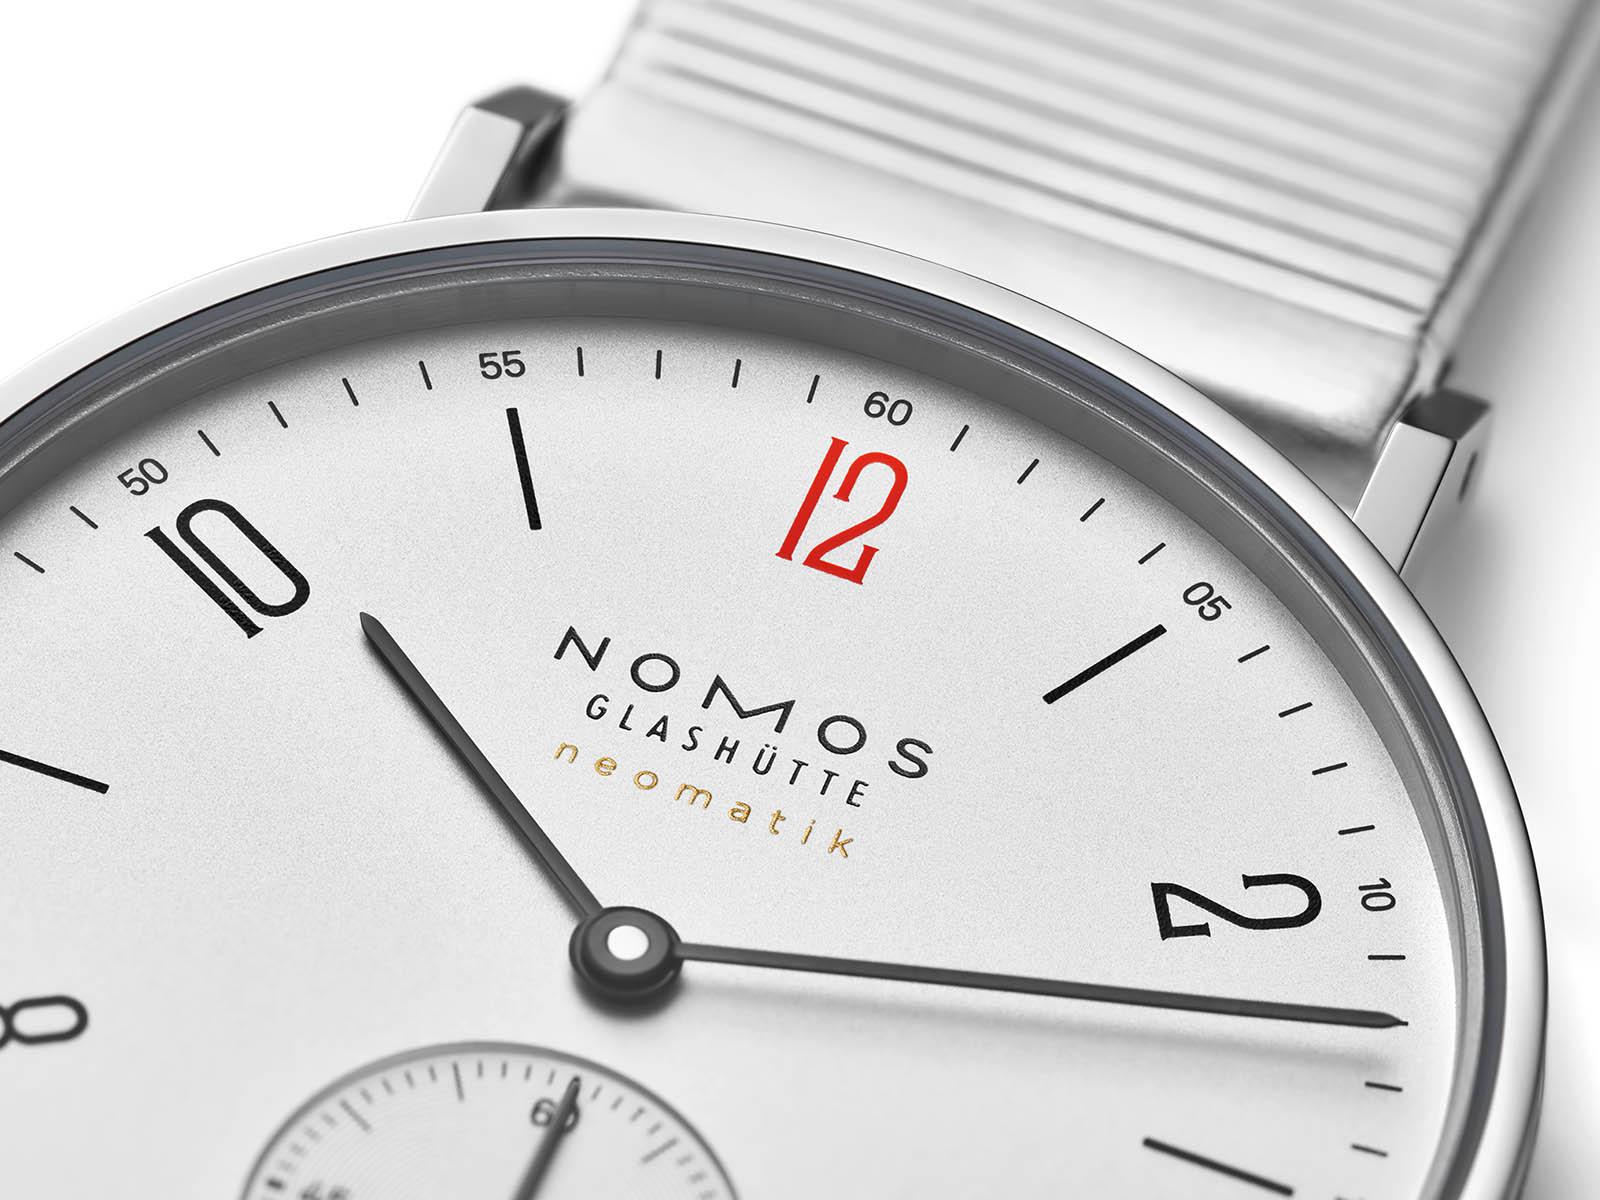 175-s2-nomos-glashutte-tangente-neomatik-medecins-sans-frontieres-4.jpg